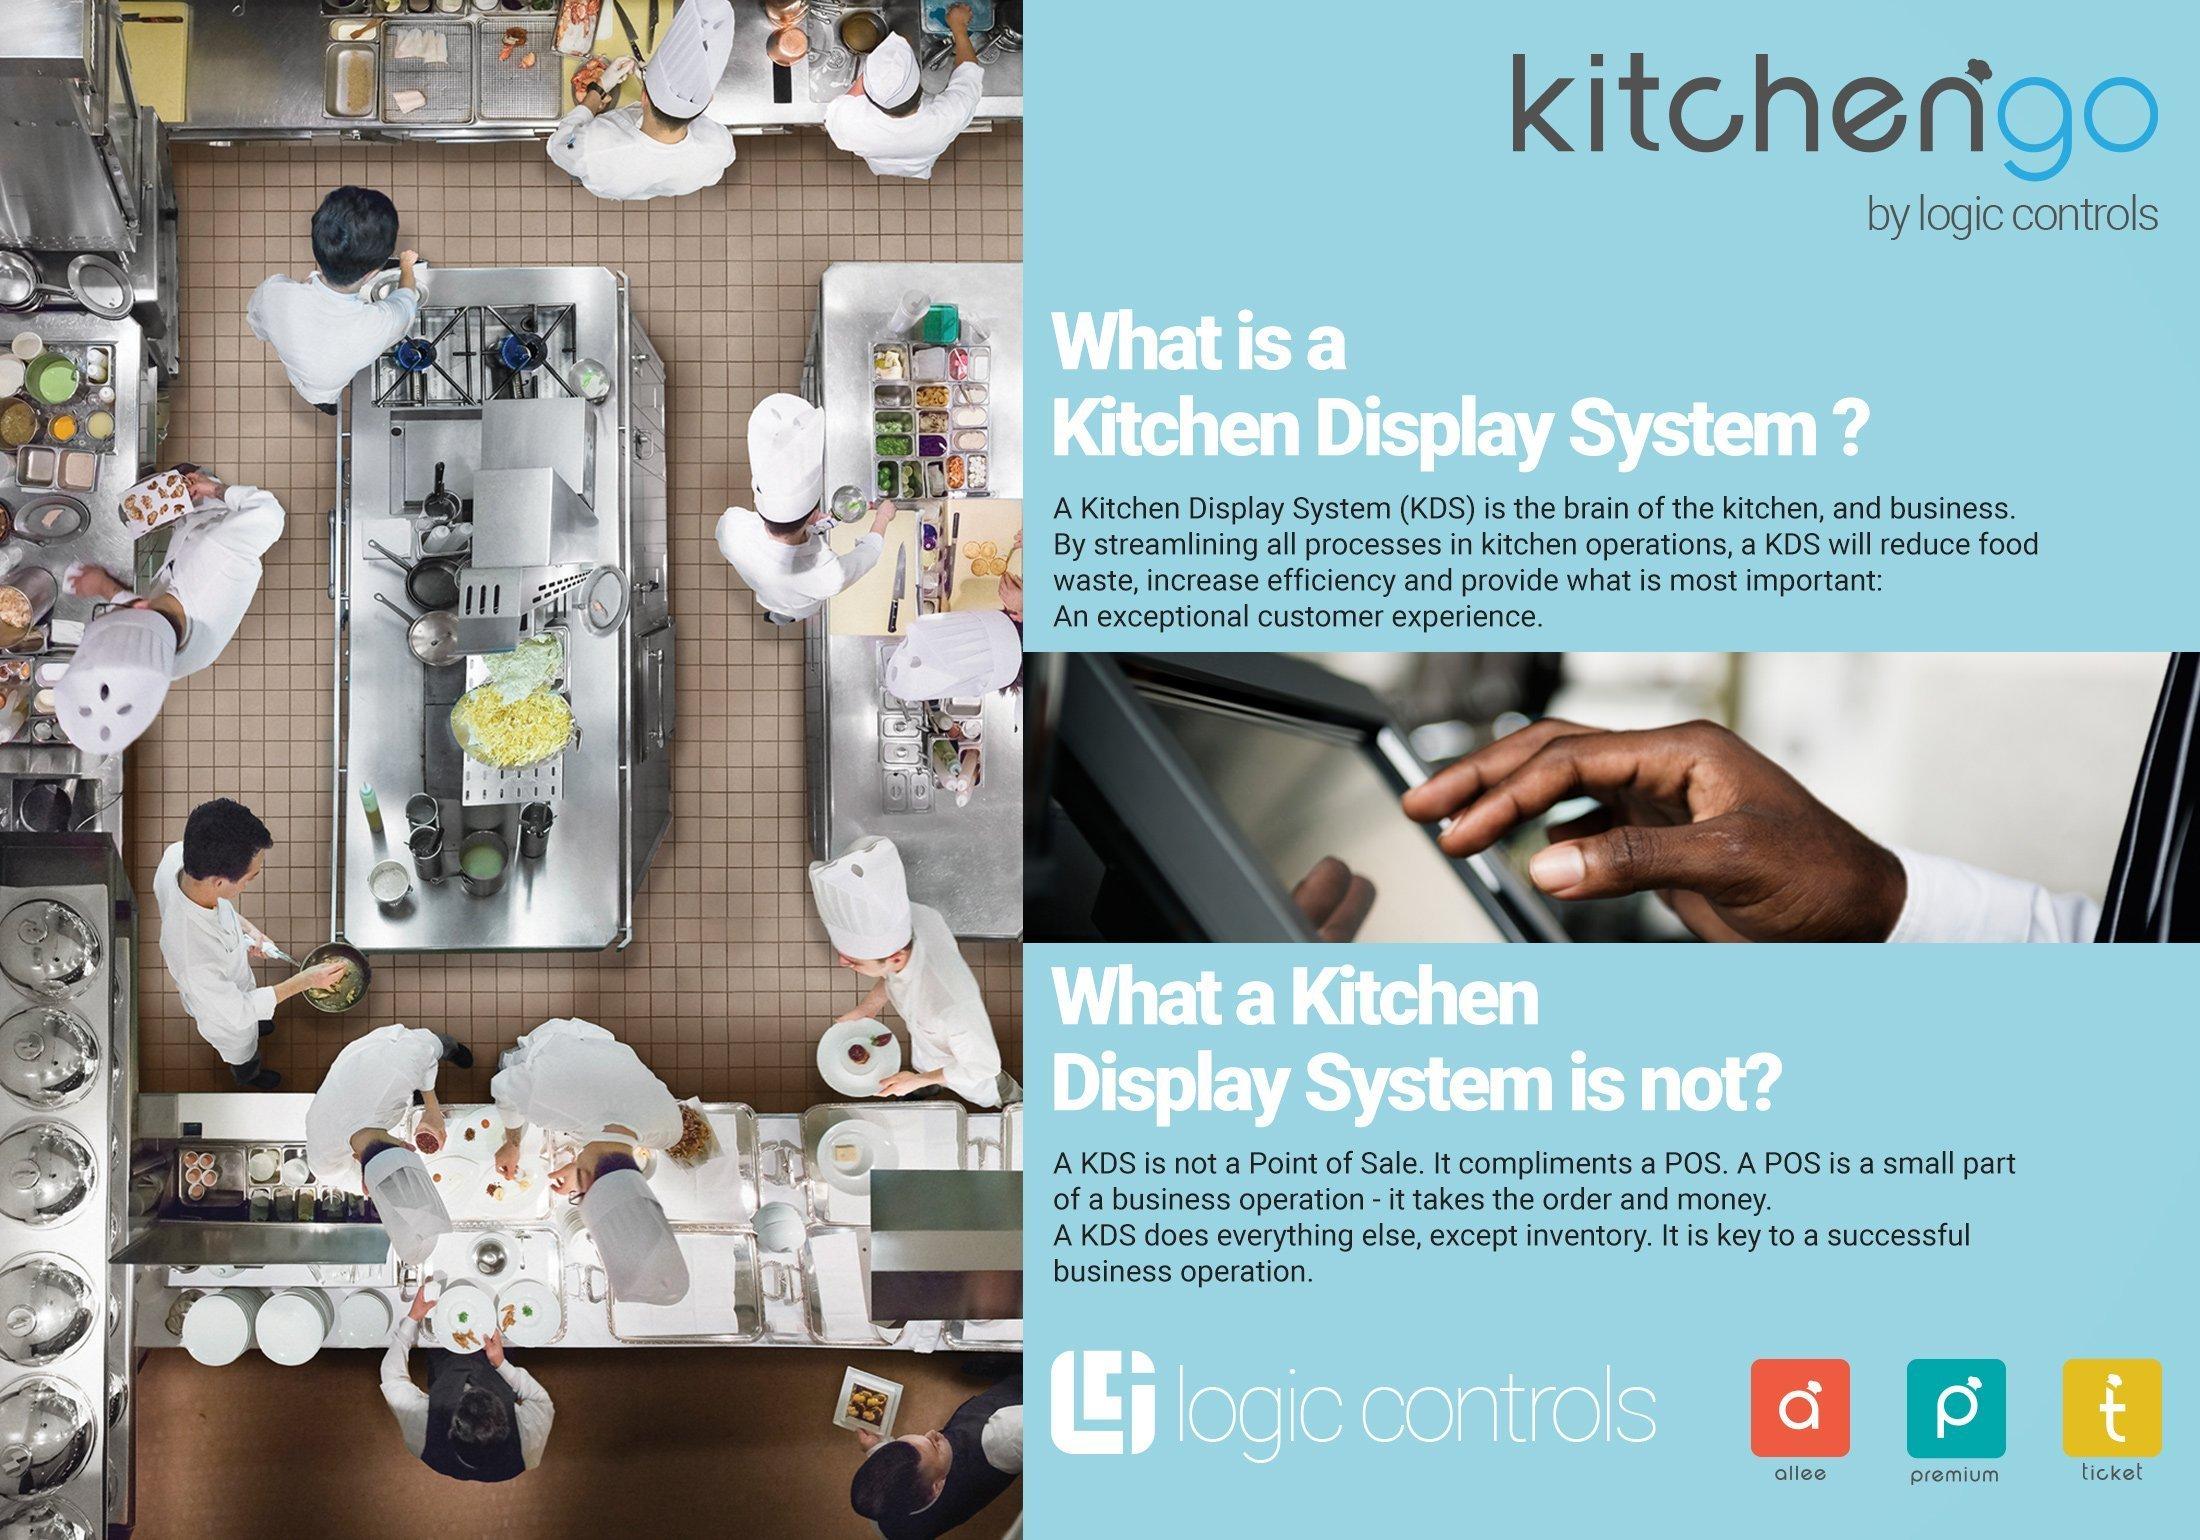 KitchenGo KDS Kitchen Display System Software Allee Premium and Ticket